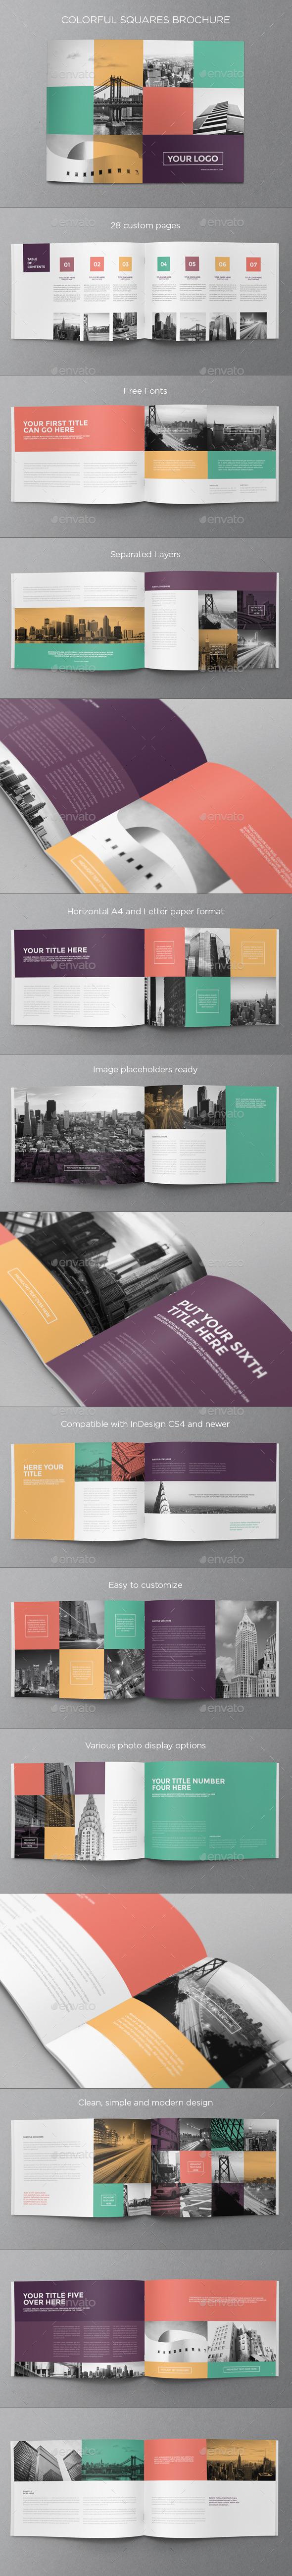 Colorful Squares Brochure - Brochures Print Templates